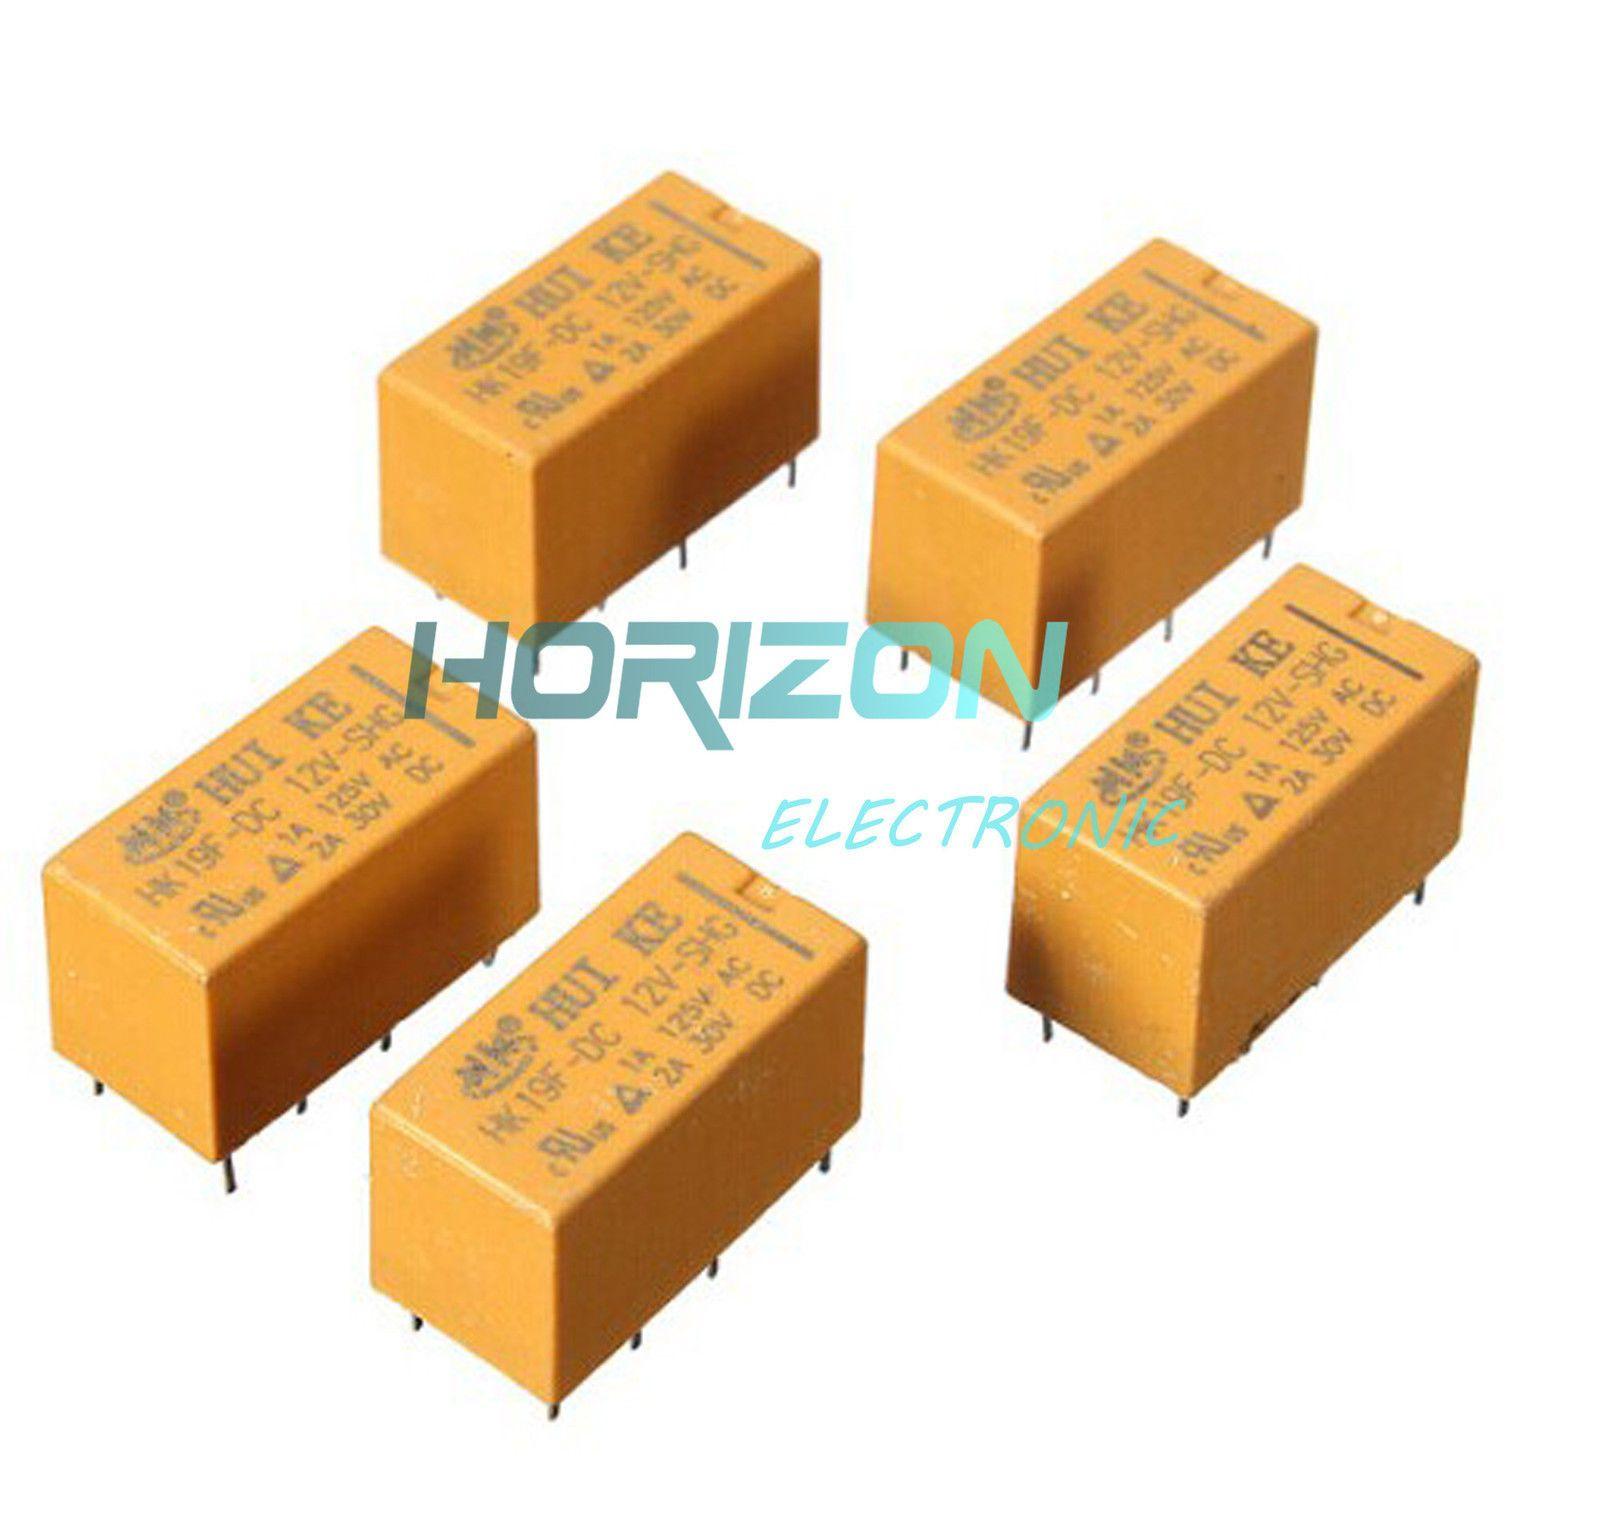 1 59 2pcs dc 12v coil dpdt 8 pin 2no 2nc mini power relays pcb type hk19f ebay electronics [ 1600 x 1515 Pixel ]